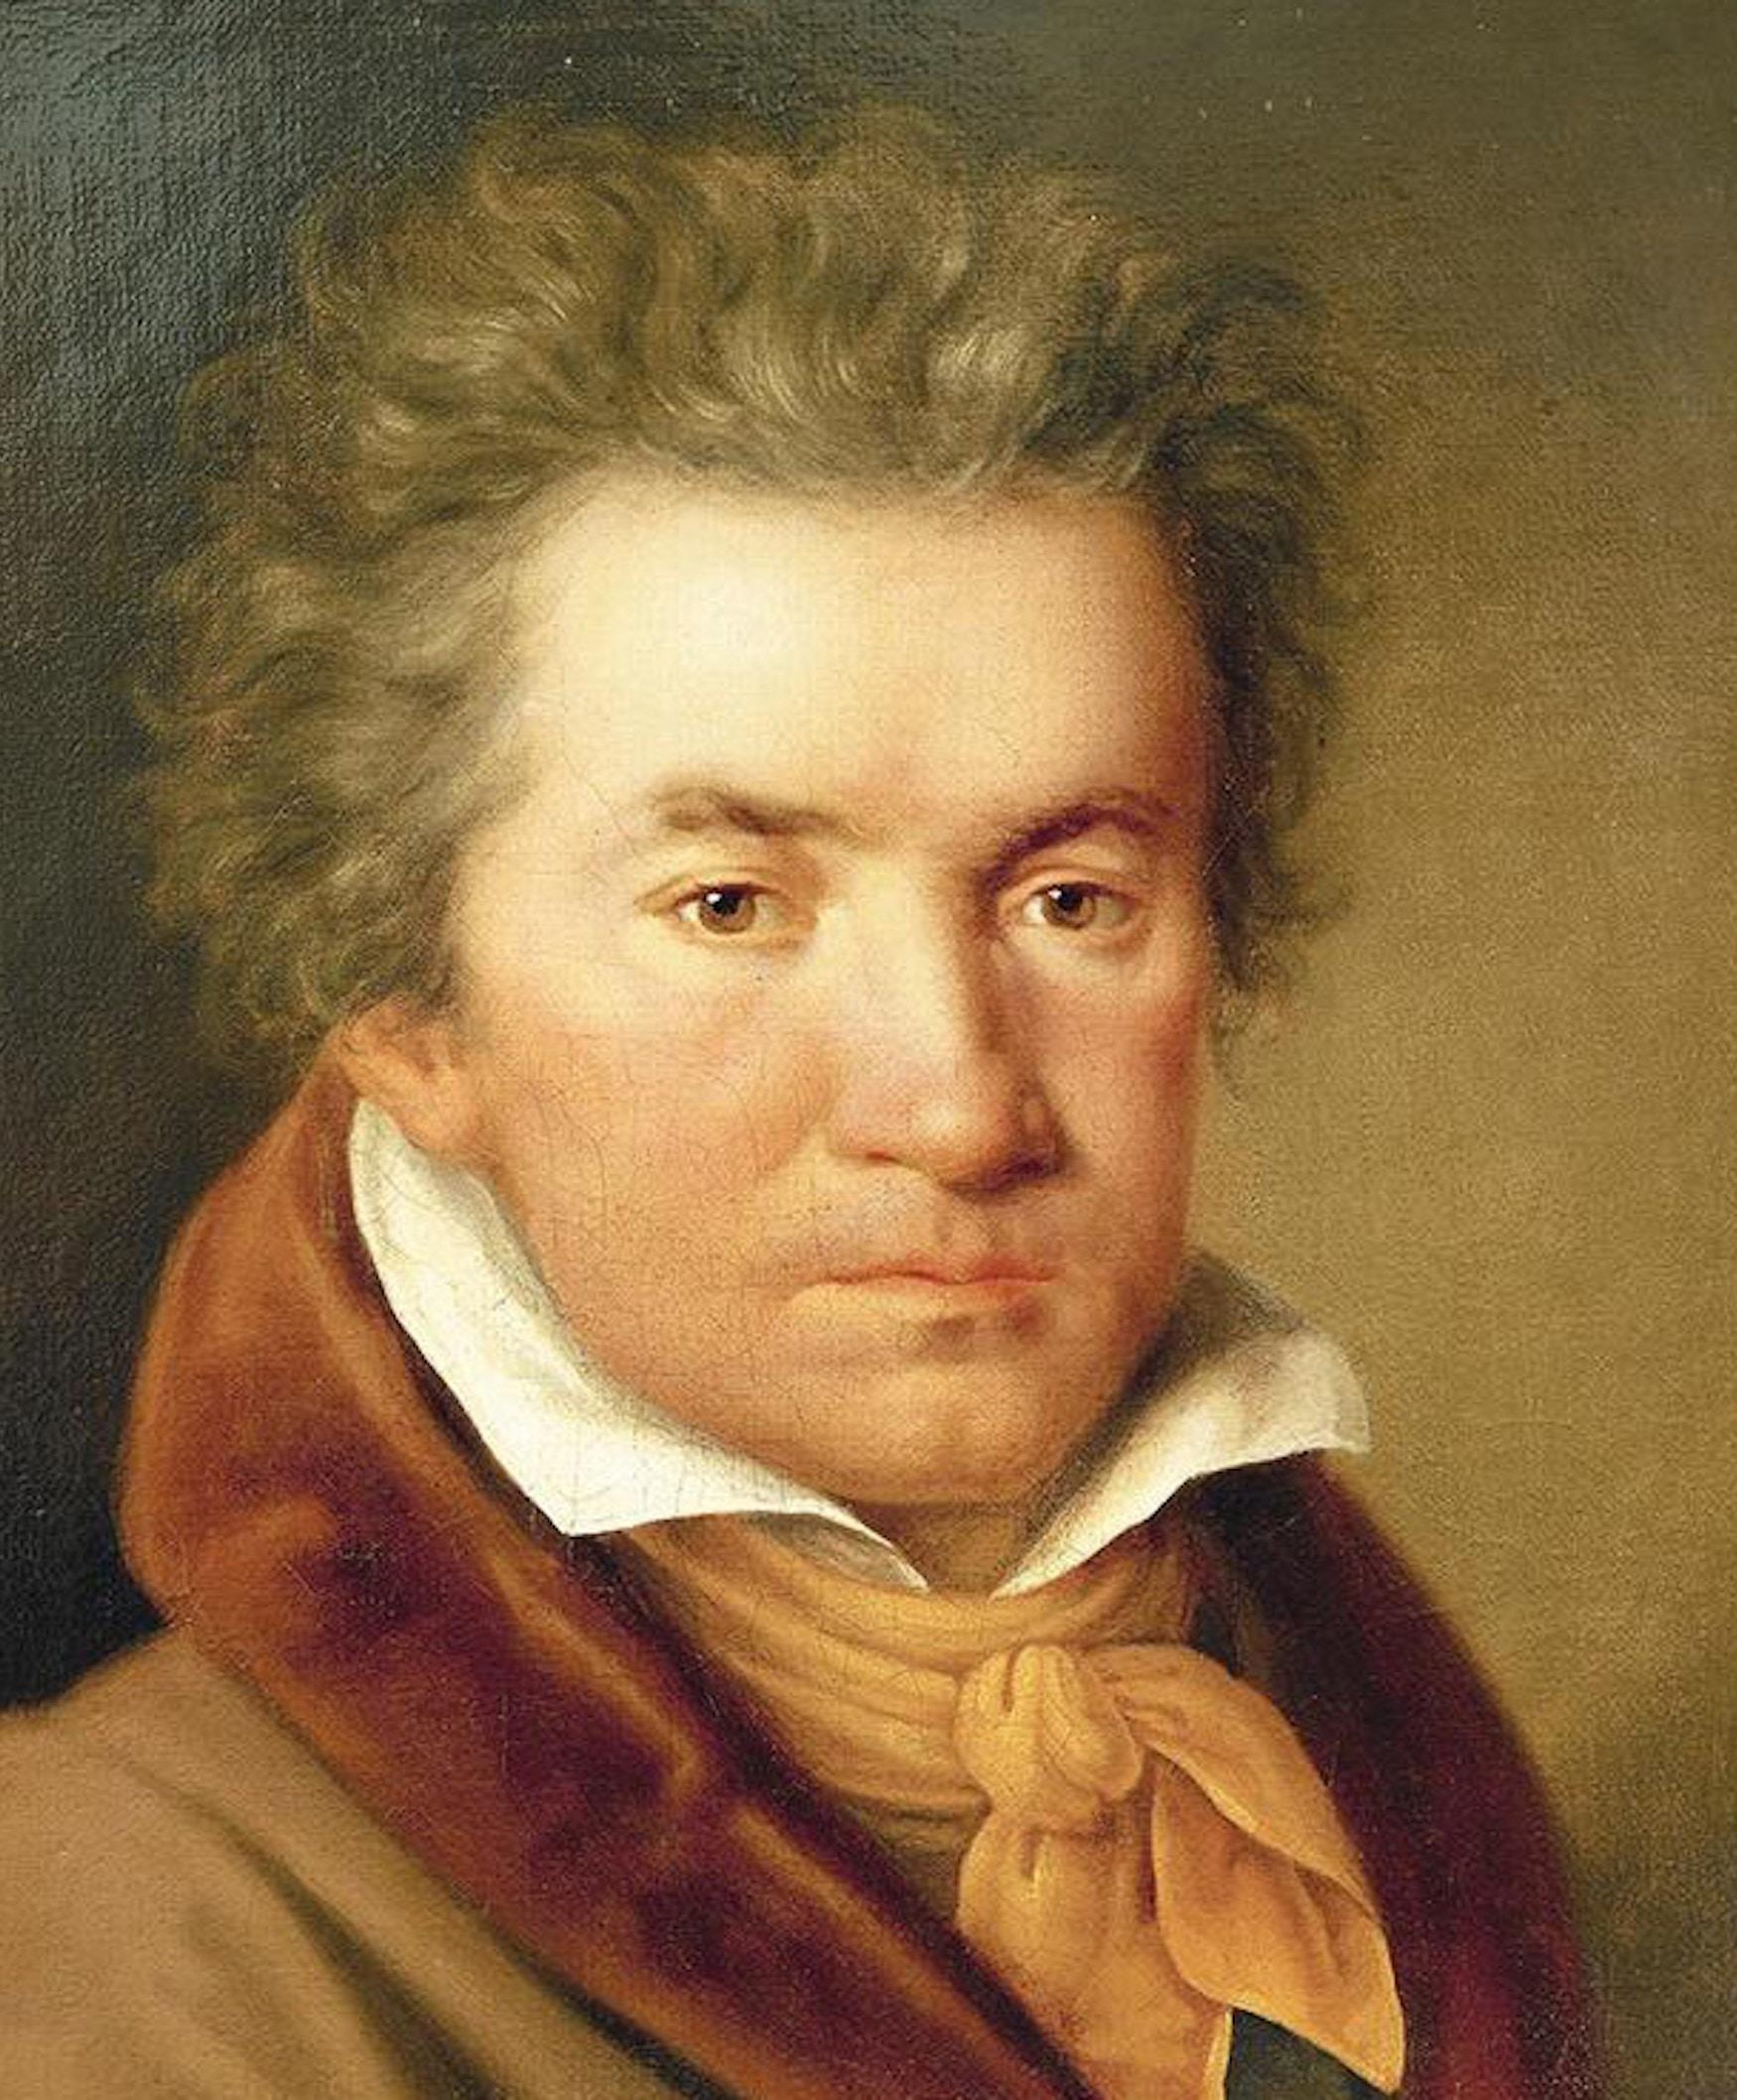 Portrett av Ludwig van Beethoven